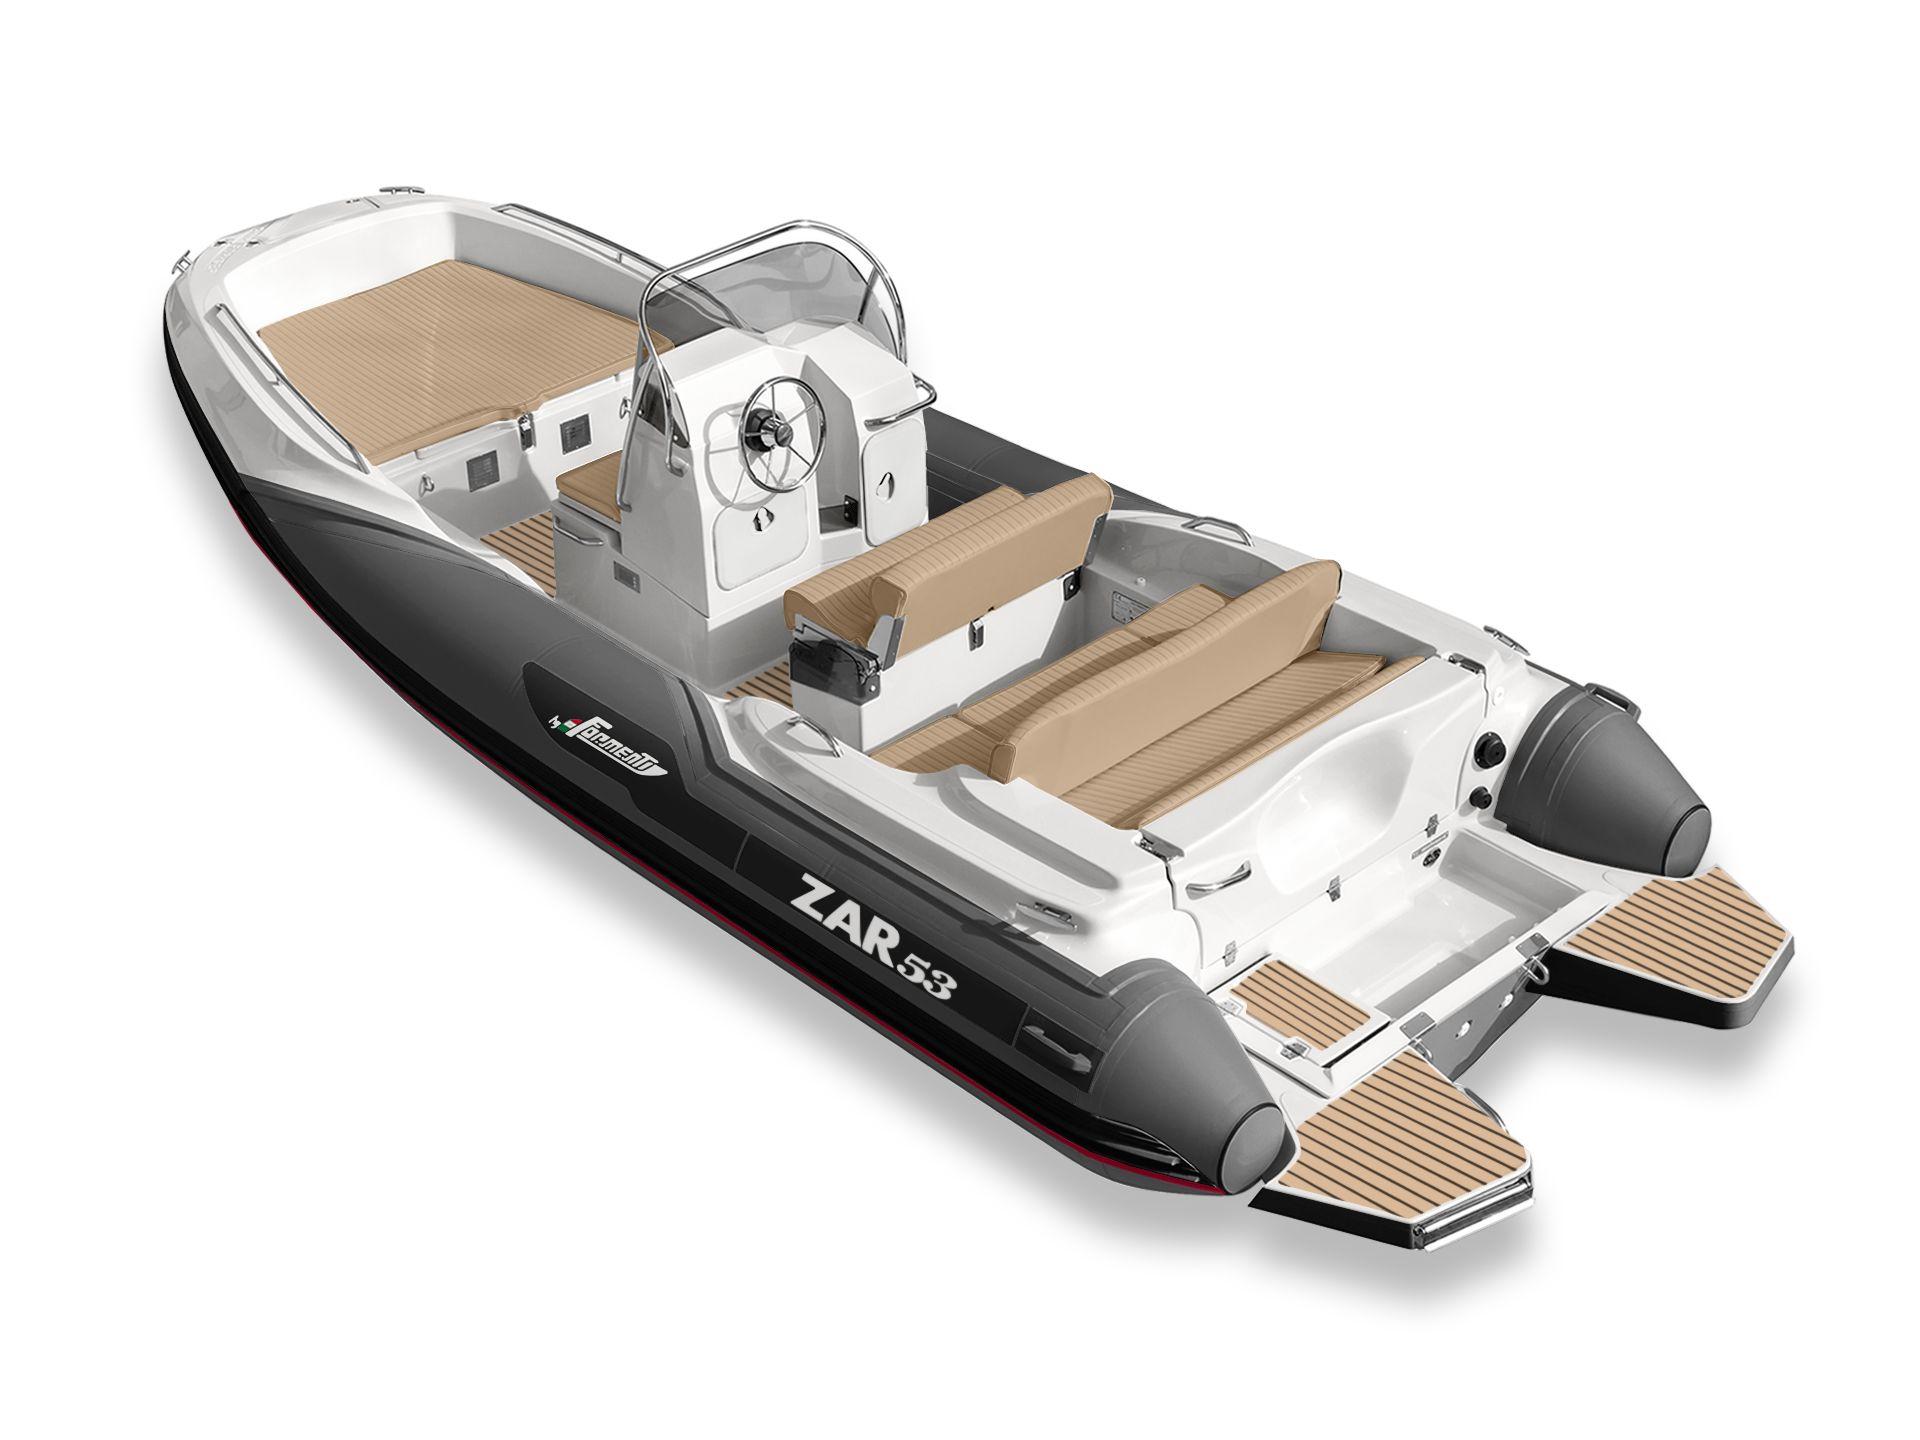 ZAR53 Classic Luxury Custom Color